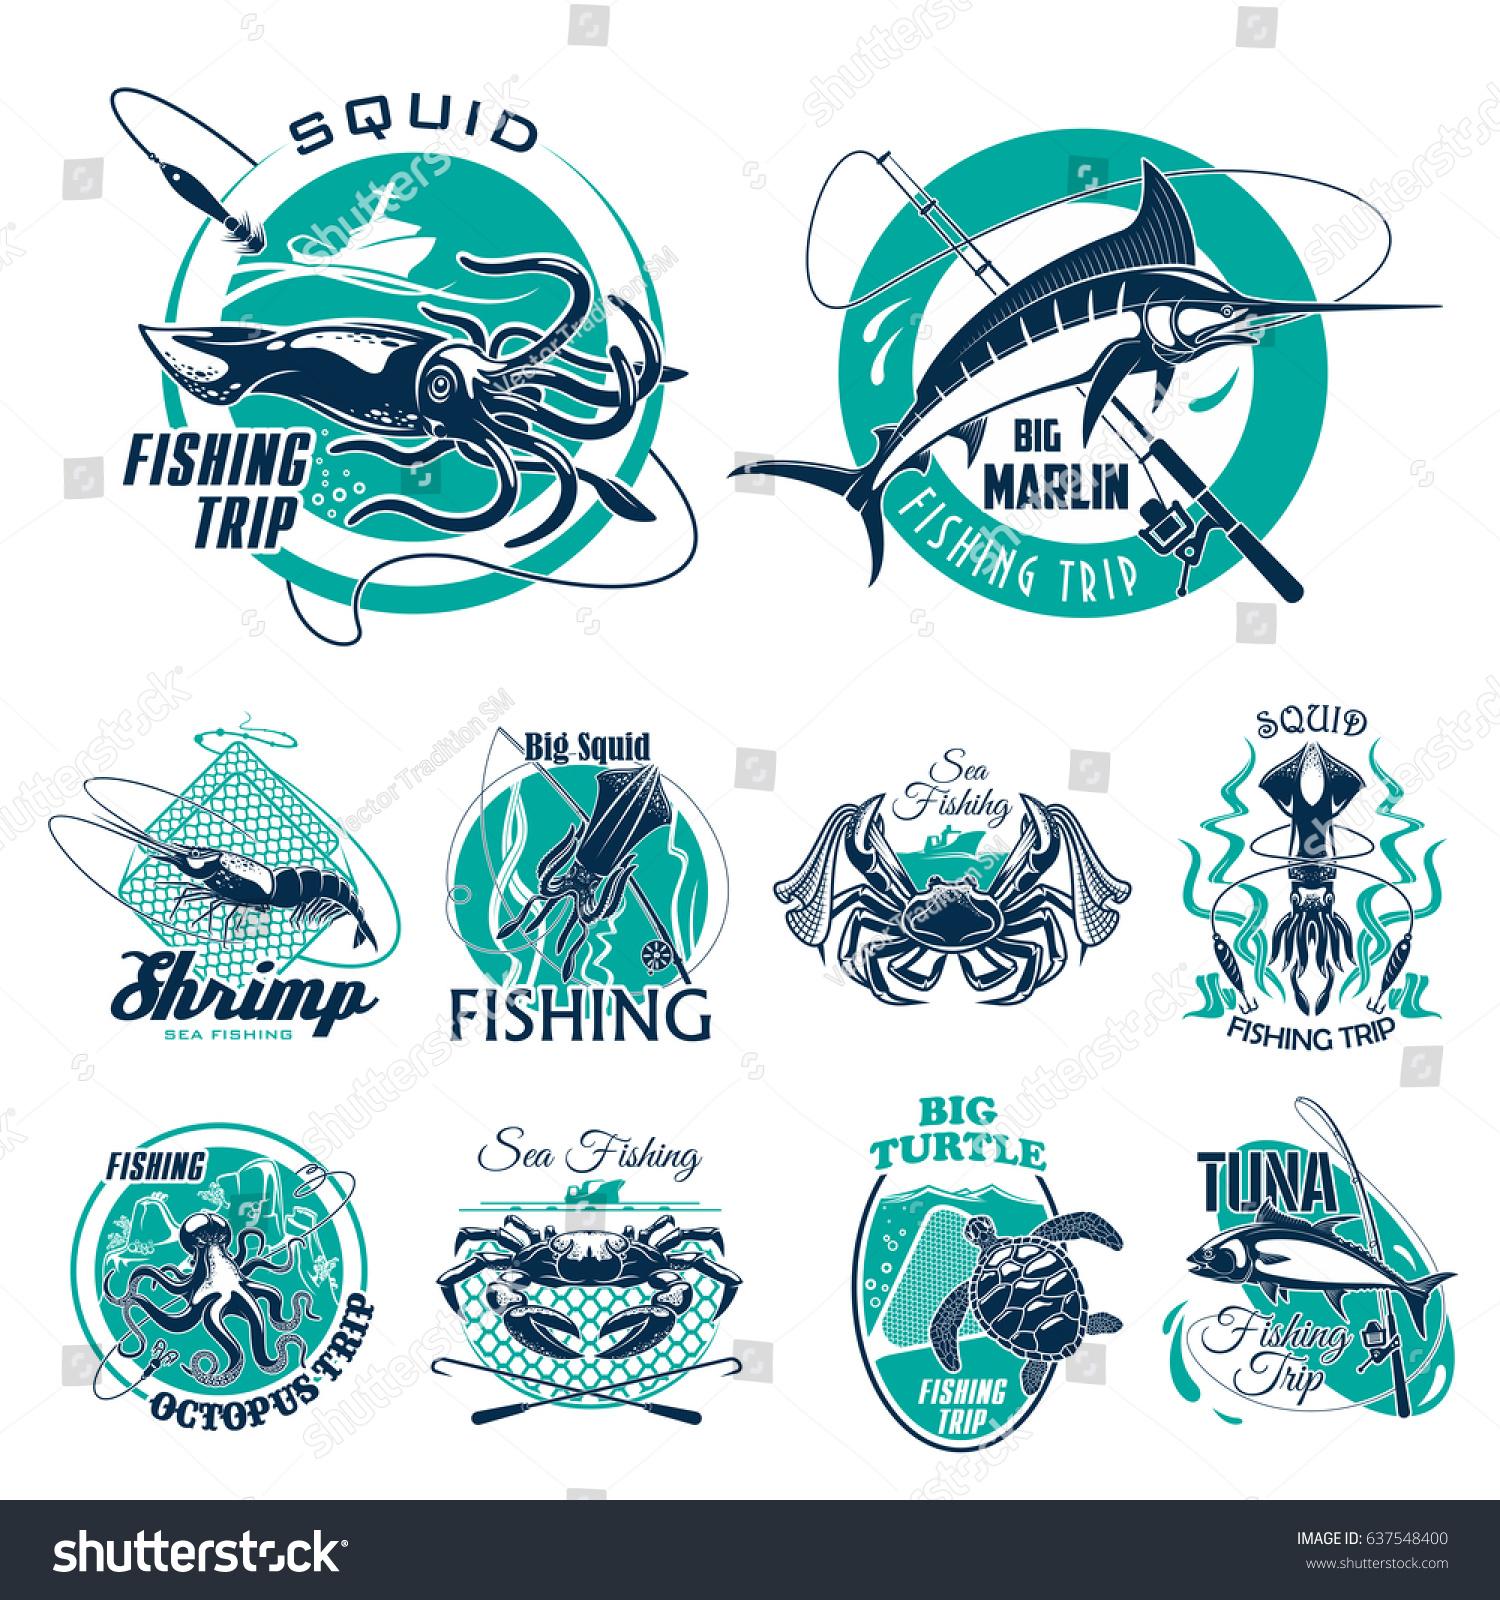 Fishing Trip Vector Icons Fisherman Adventure Stock Vector Hd